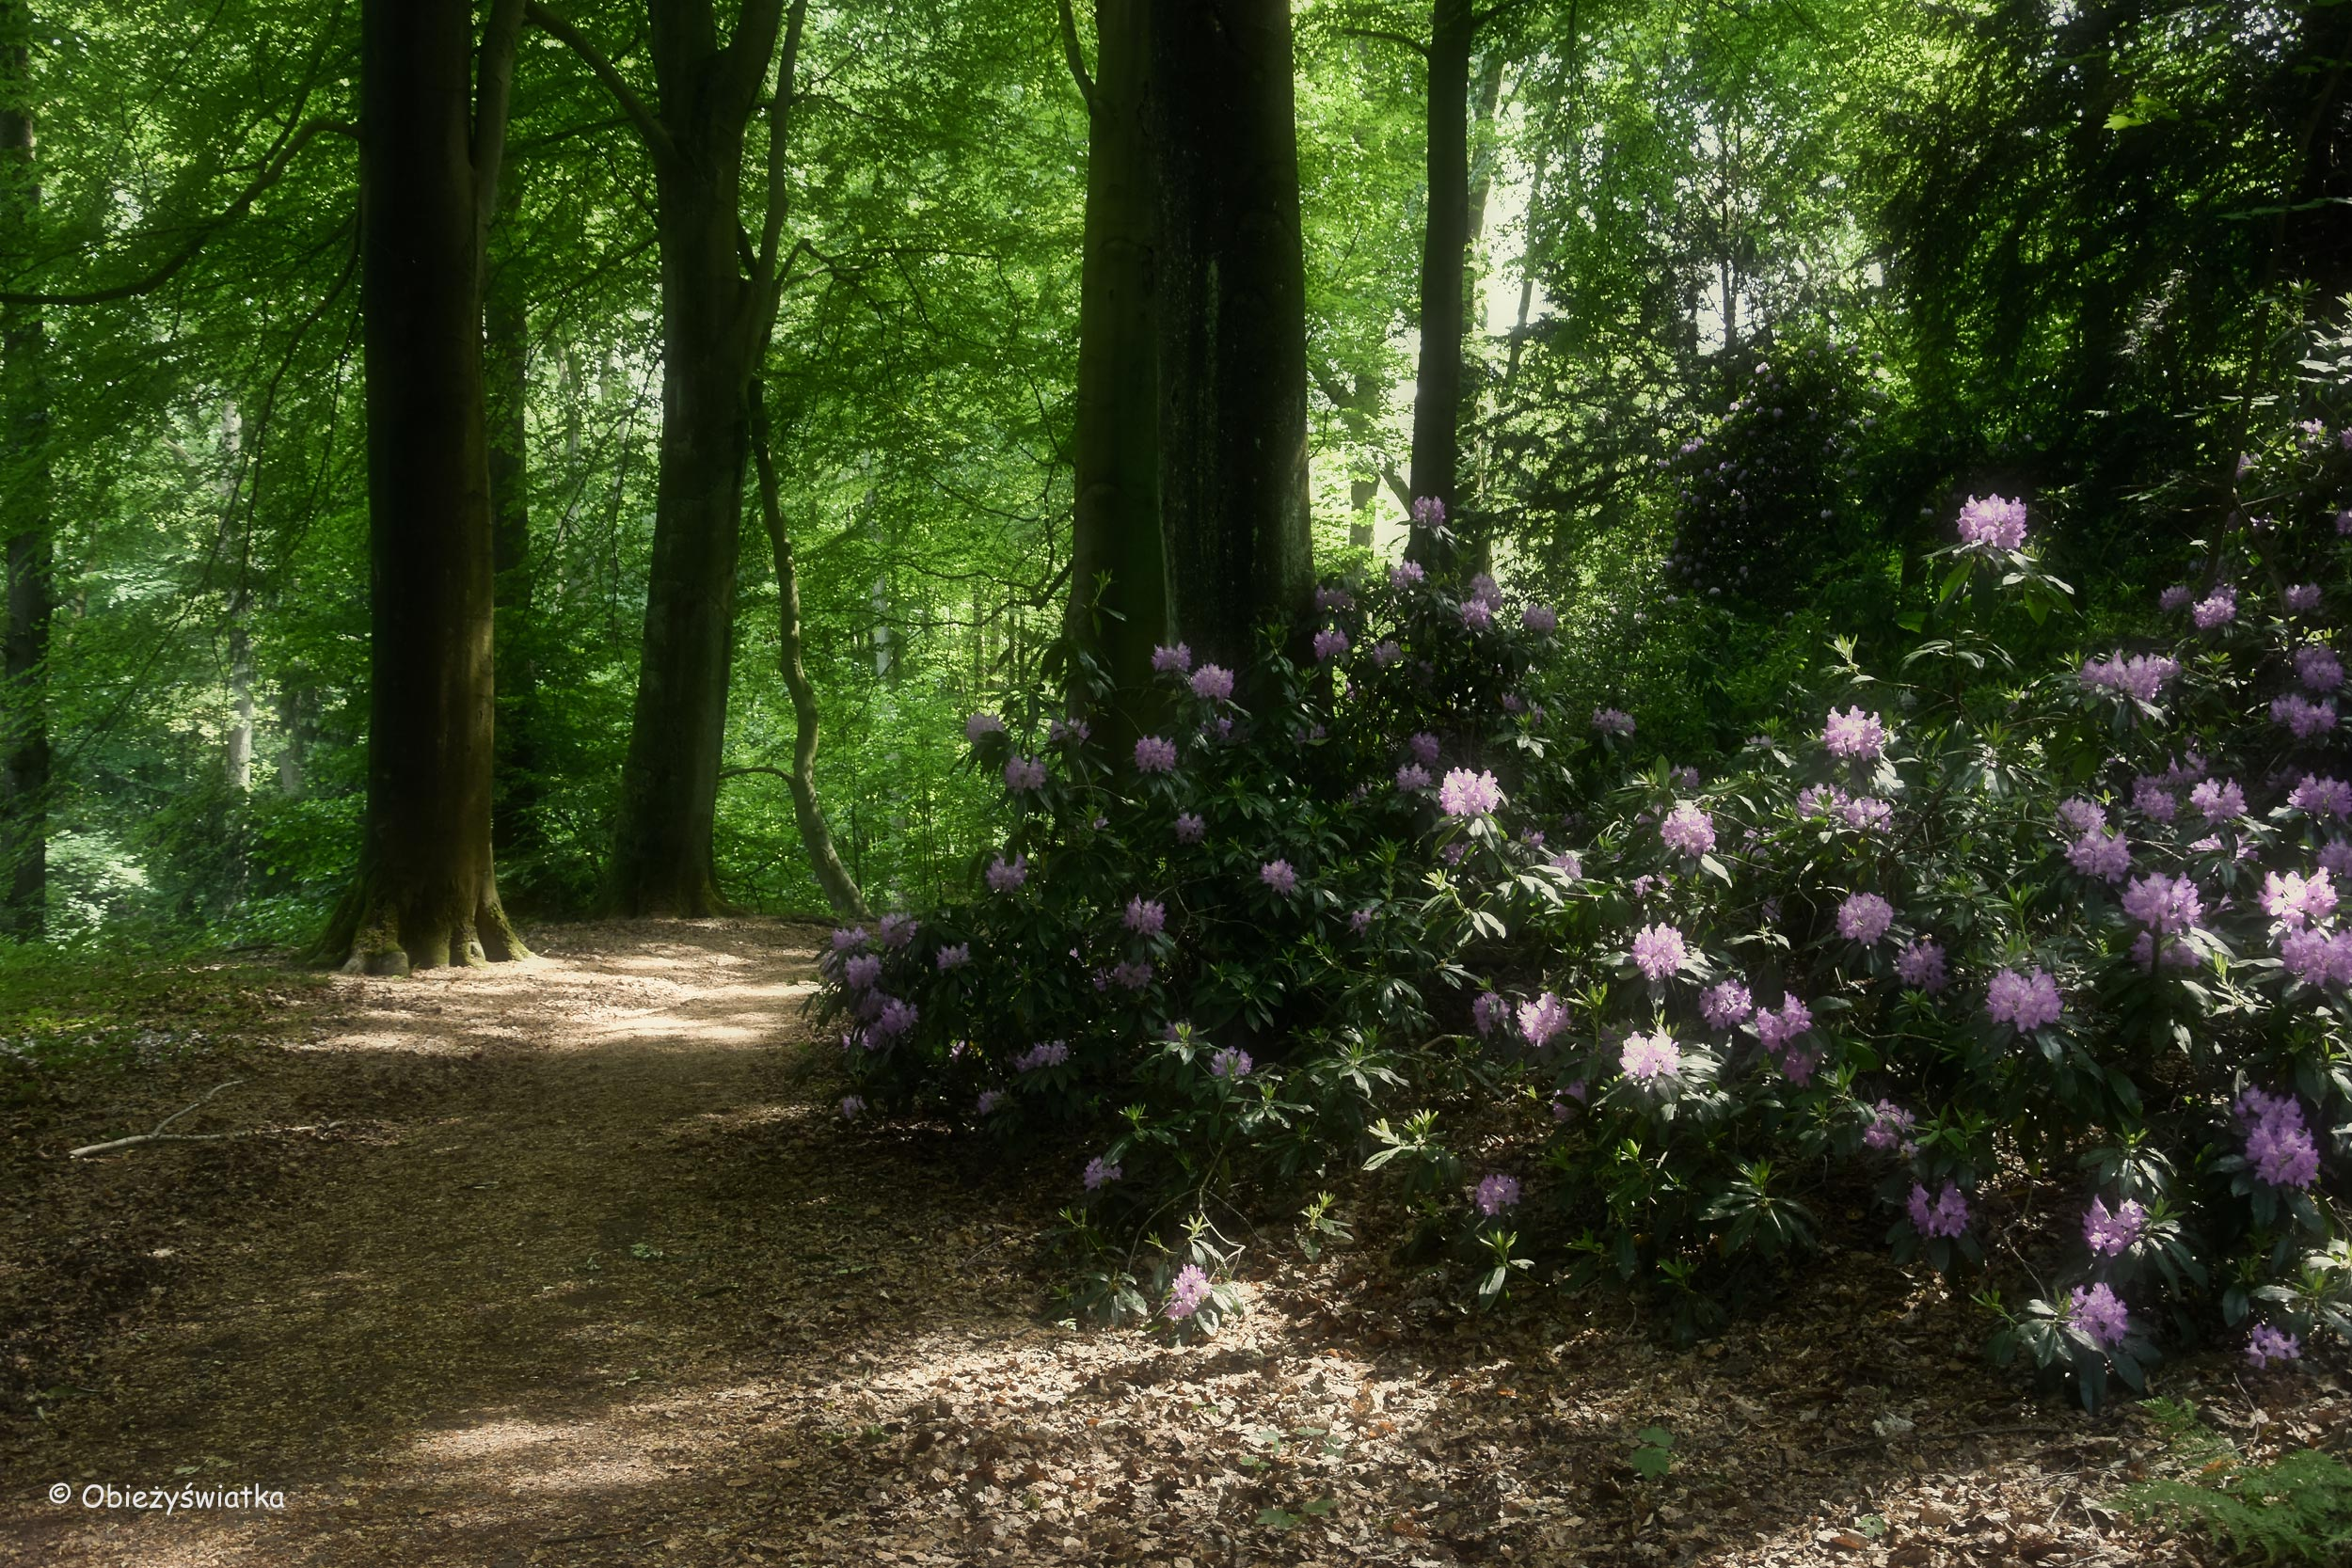 I piękne leśne drogi wśród rododendronów, Baldeneysteig, Essen